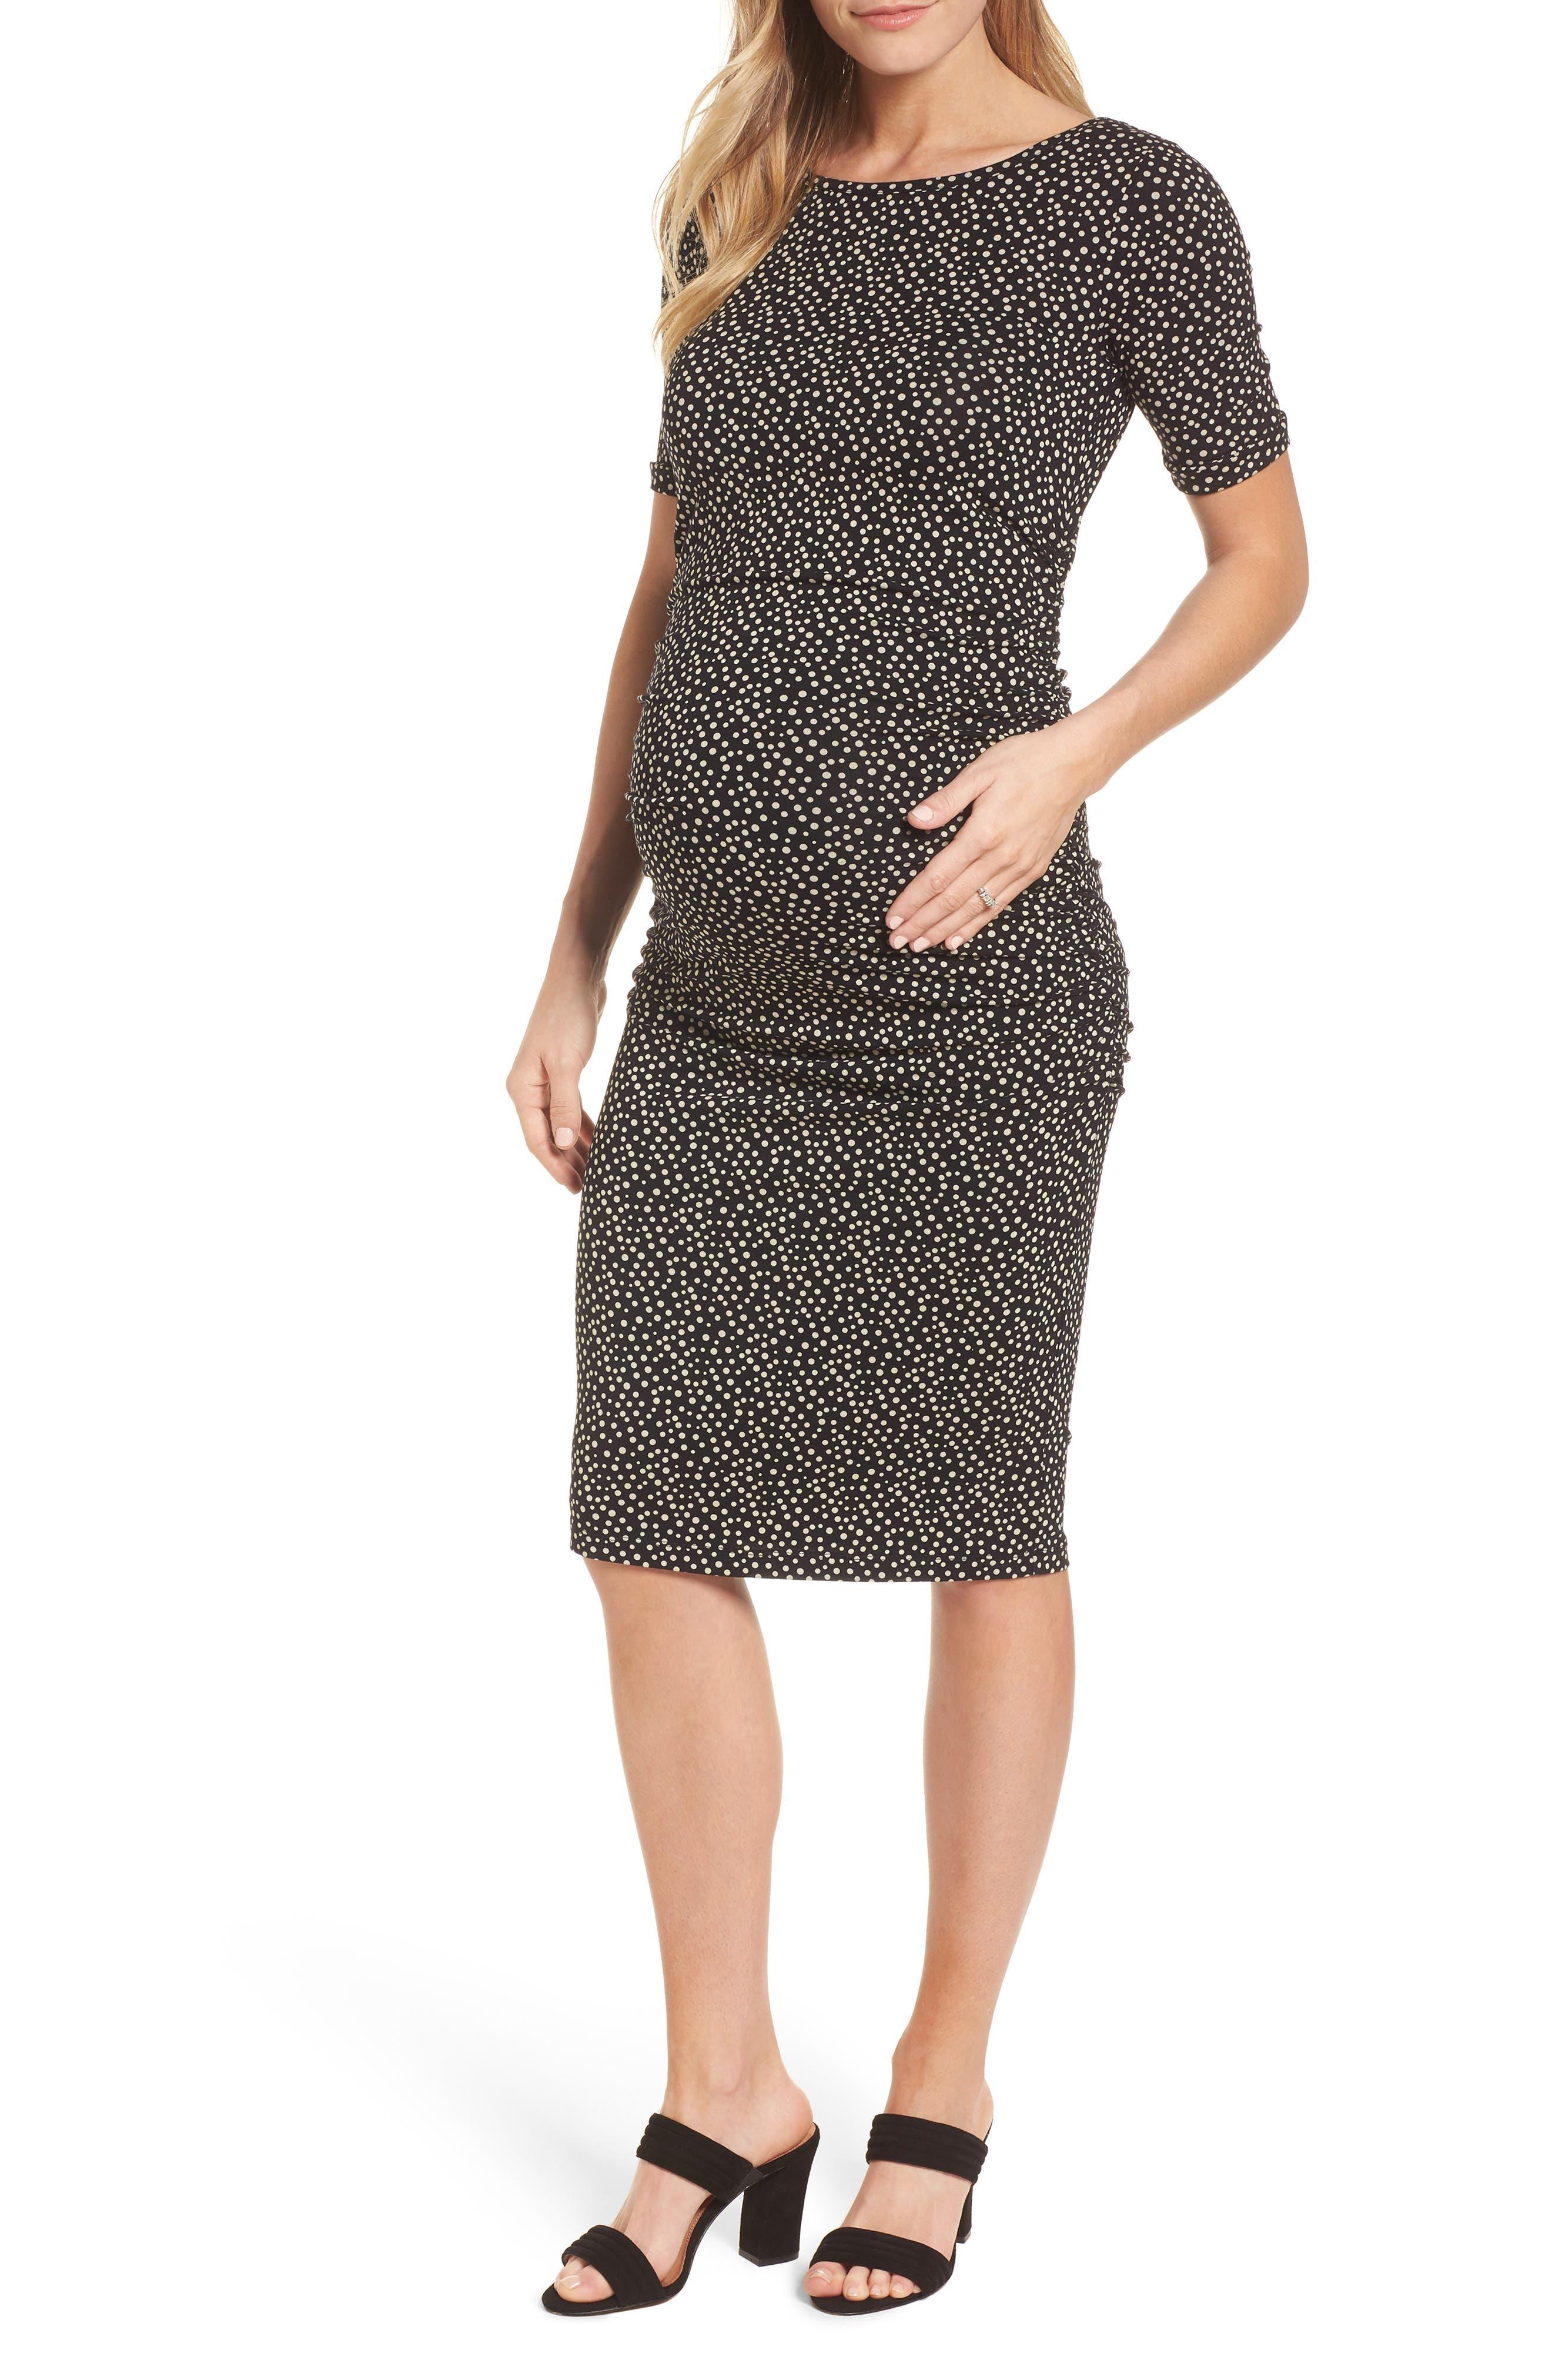 Danni Ruched Maternity Dress,                         Main,                         color, Polka Print